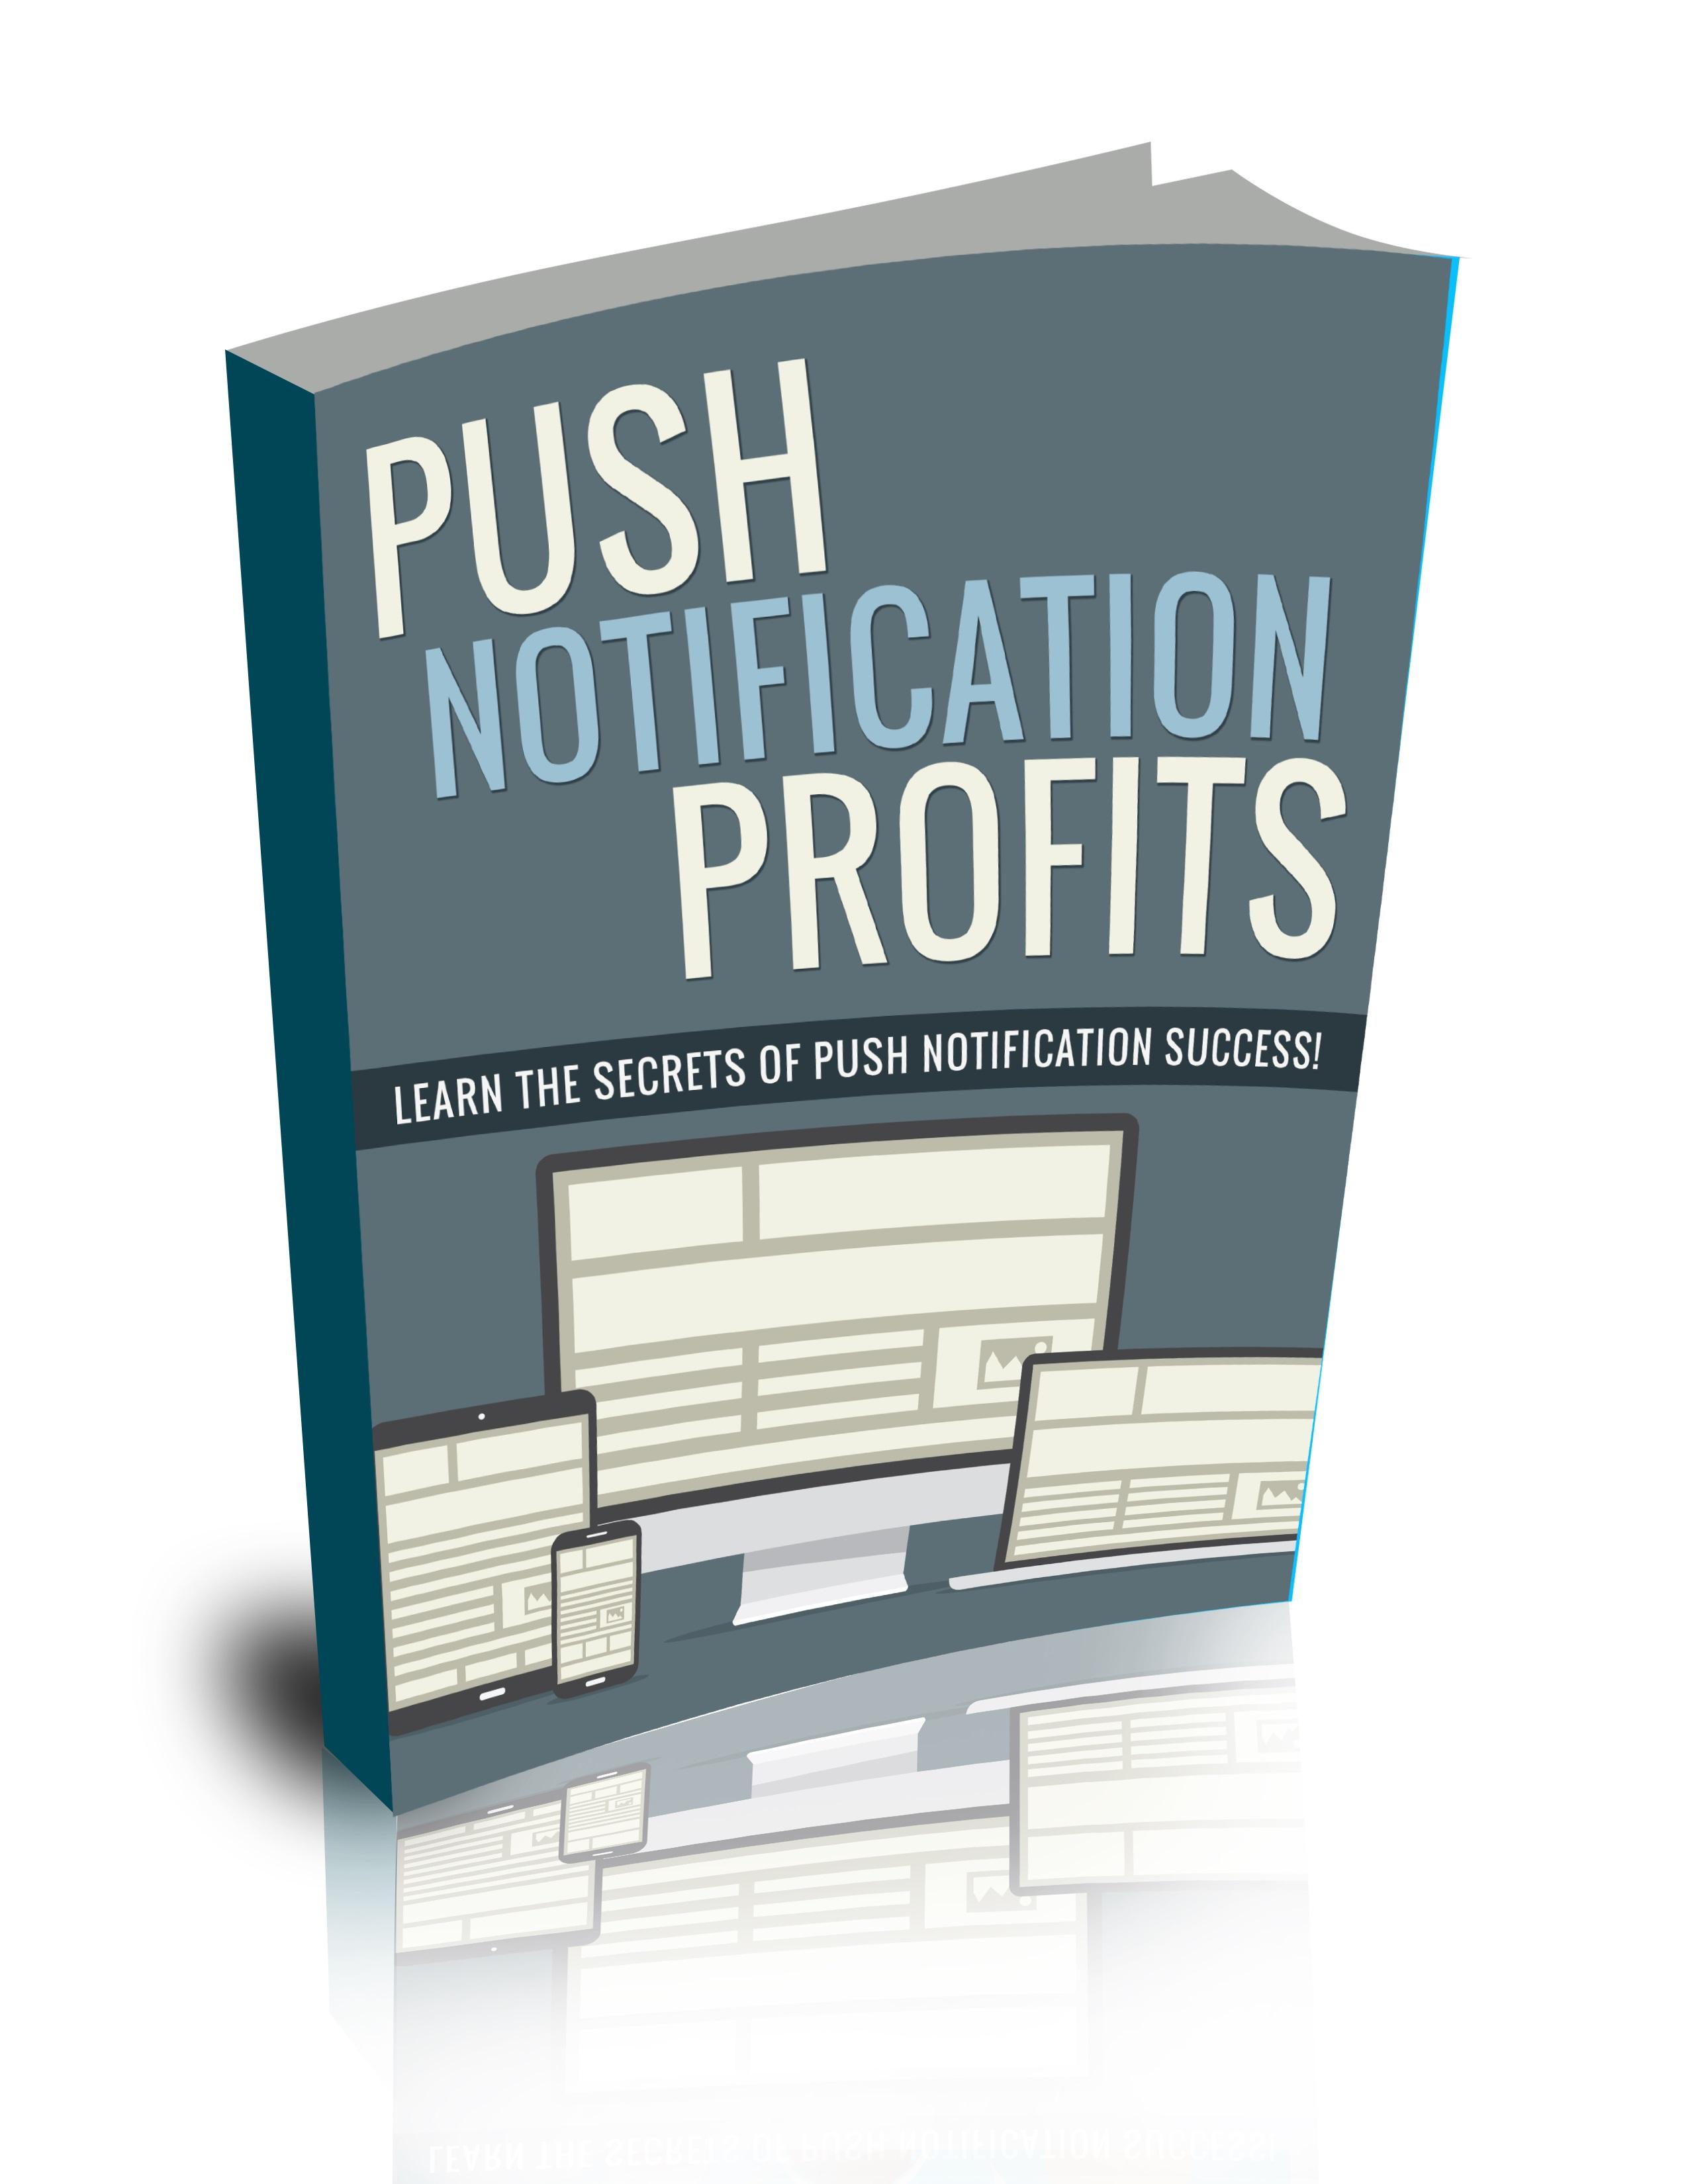 Push Notification Profits Package